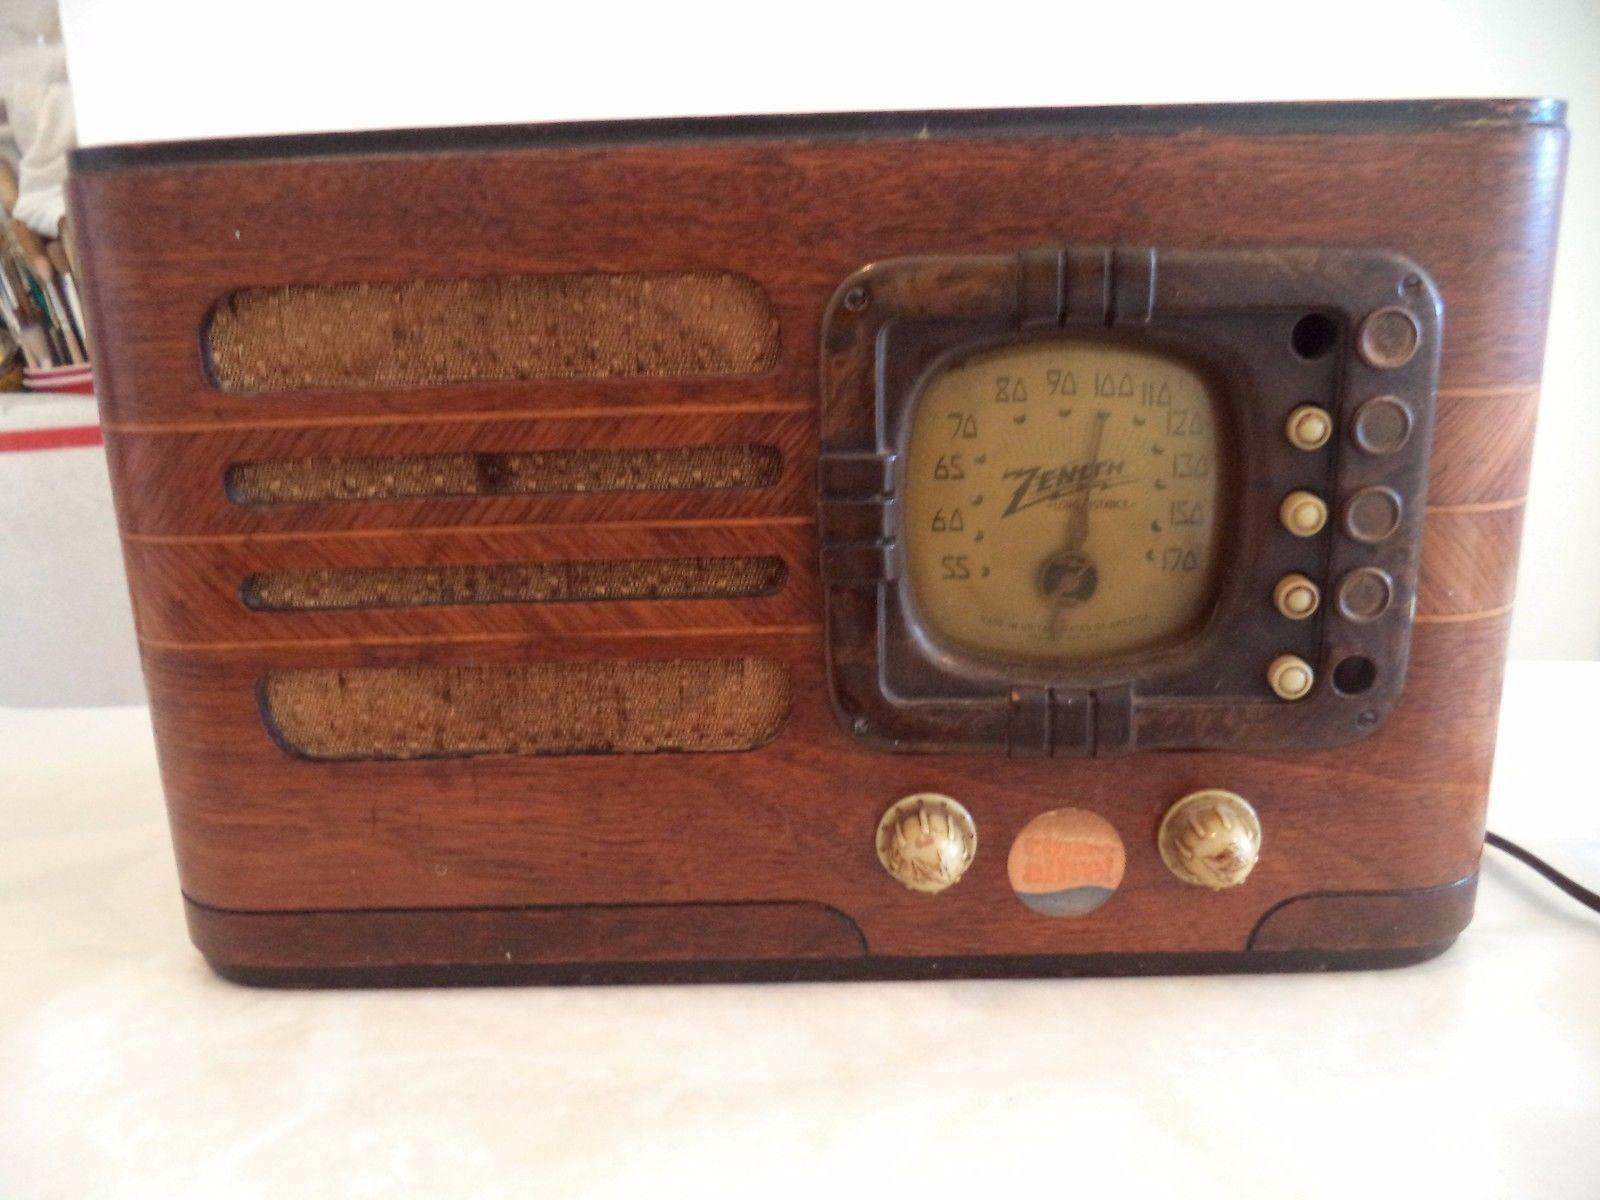 Fabulous 1939 Zenith Wooden Tube Radio Model 6d316 As Is For Parts Repair Ebay Radio Vintage Wood Repair